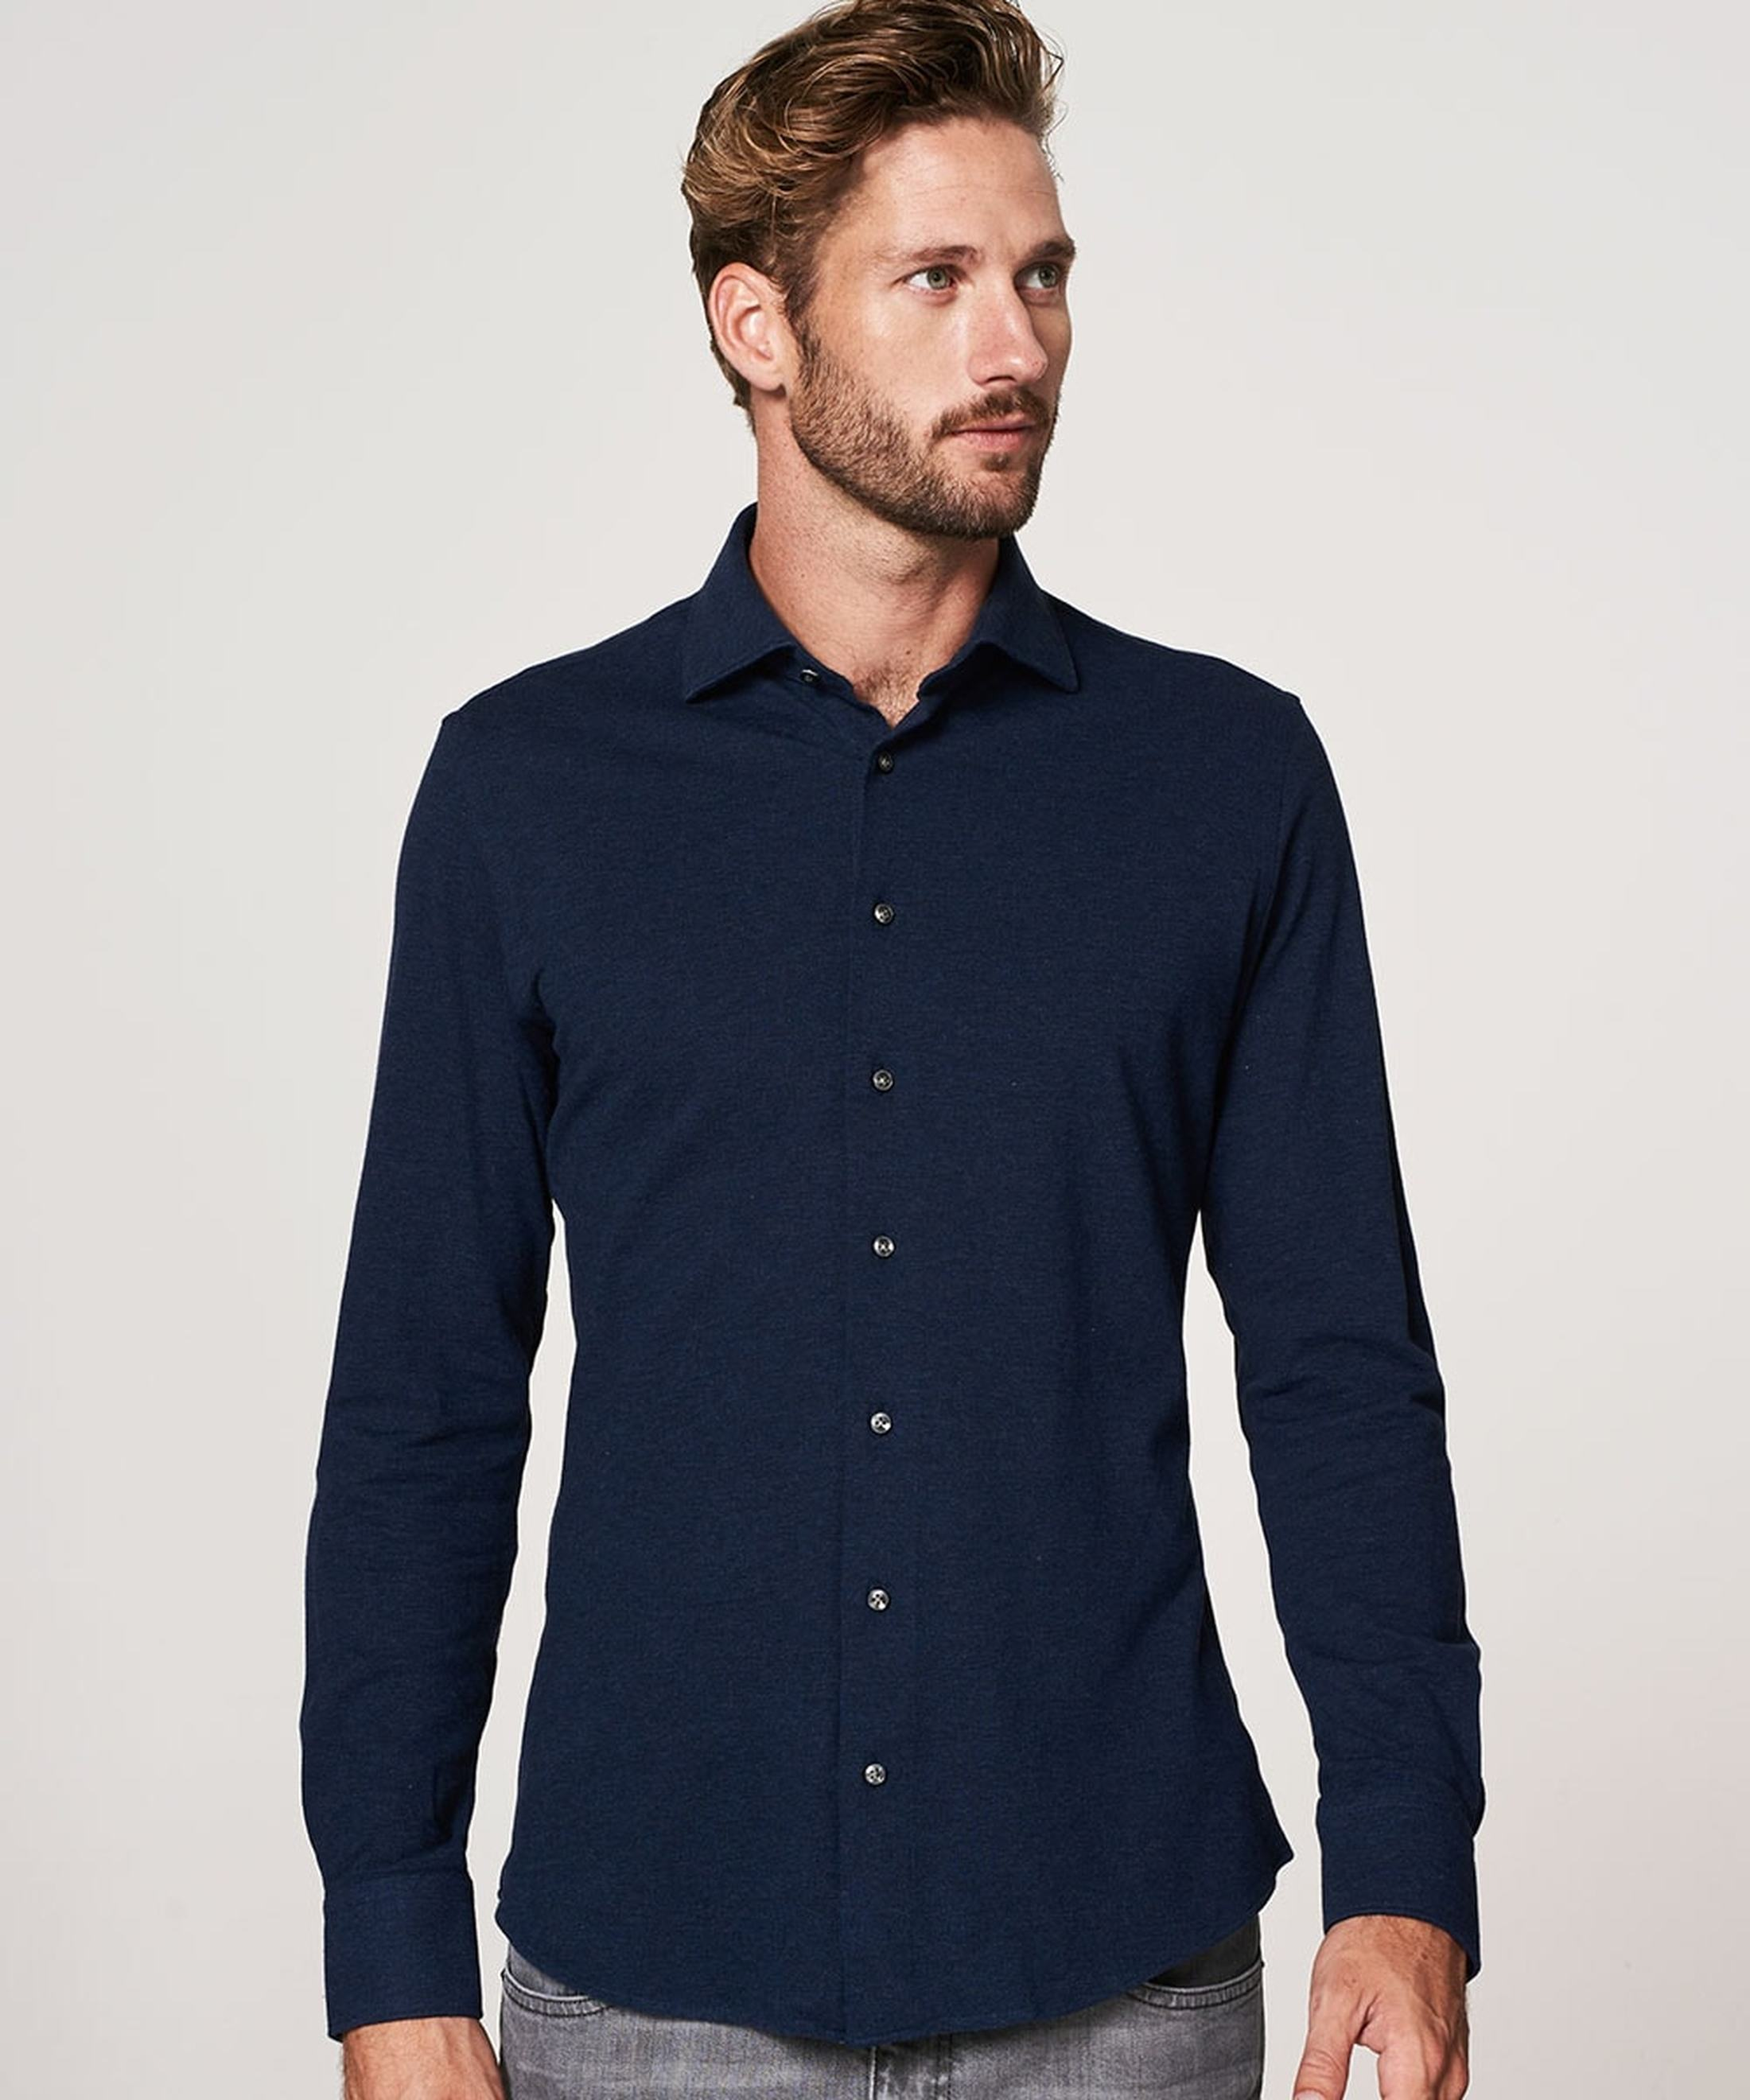 Profuomo Shirt Knitted Dark Blue foto 4